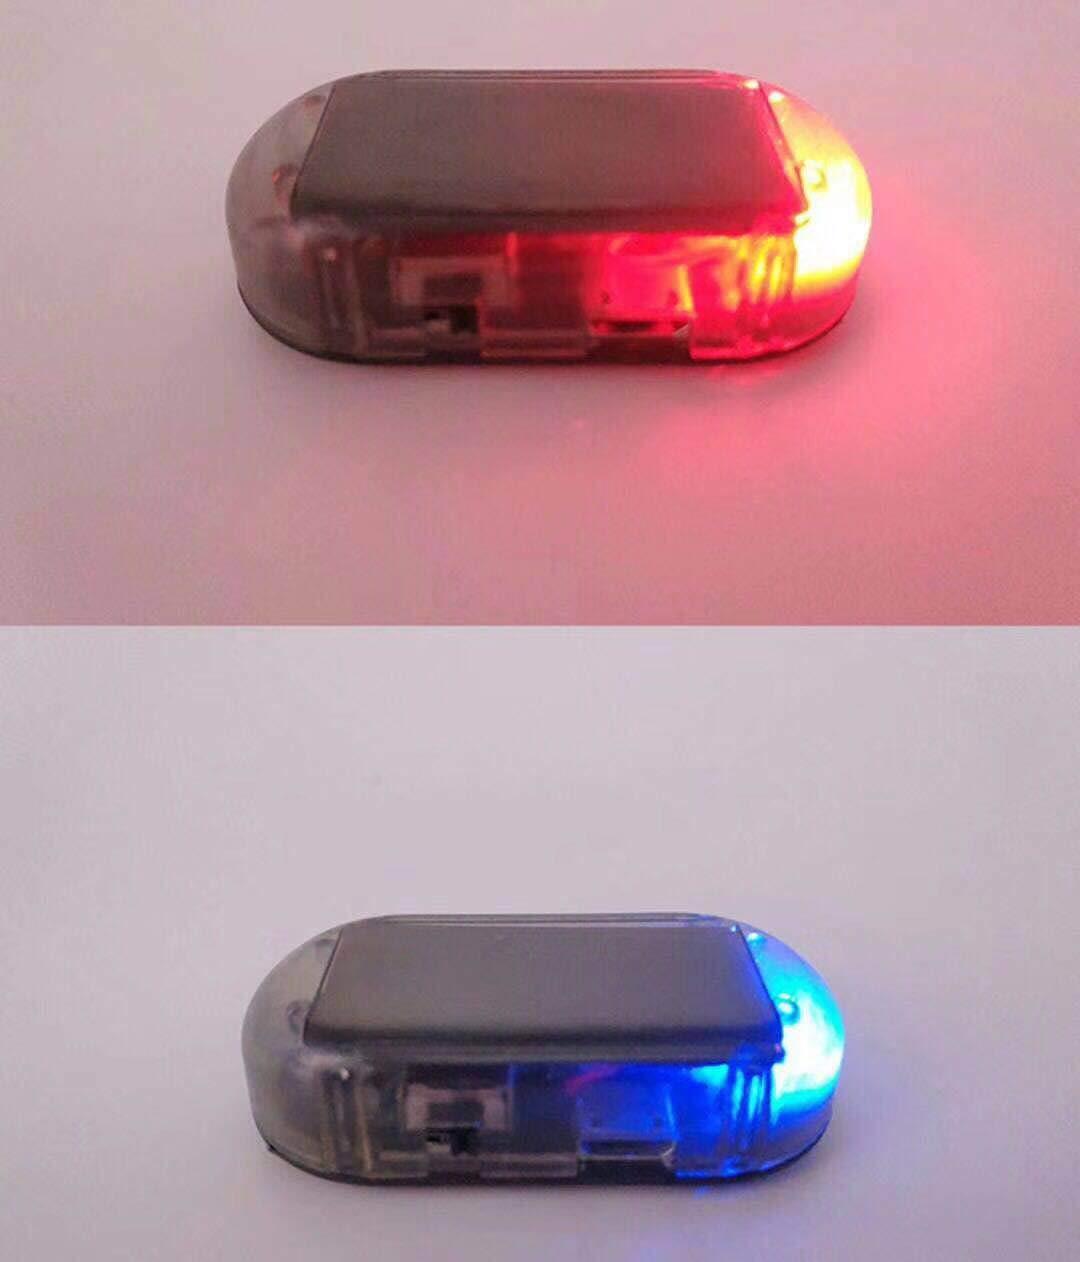 Be-one Solar Car Dummy Alarm LED Light, Simulated Imitation Security System Anti-Theft Flashing Blinking Lamp(Red + Blue)